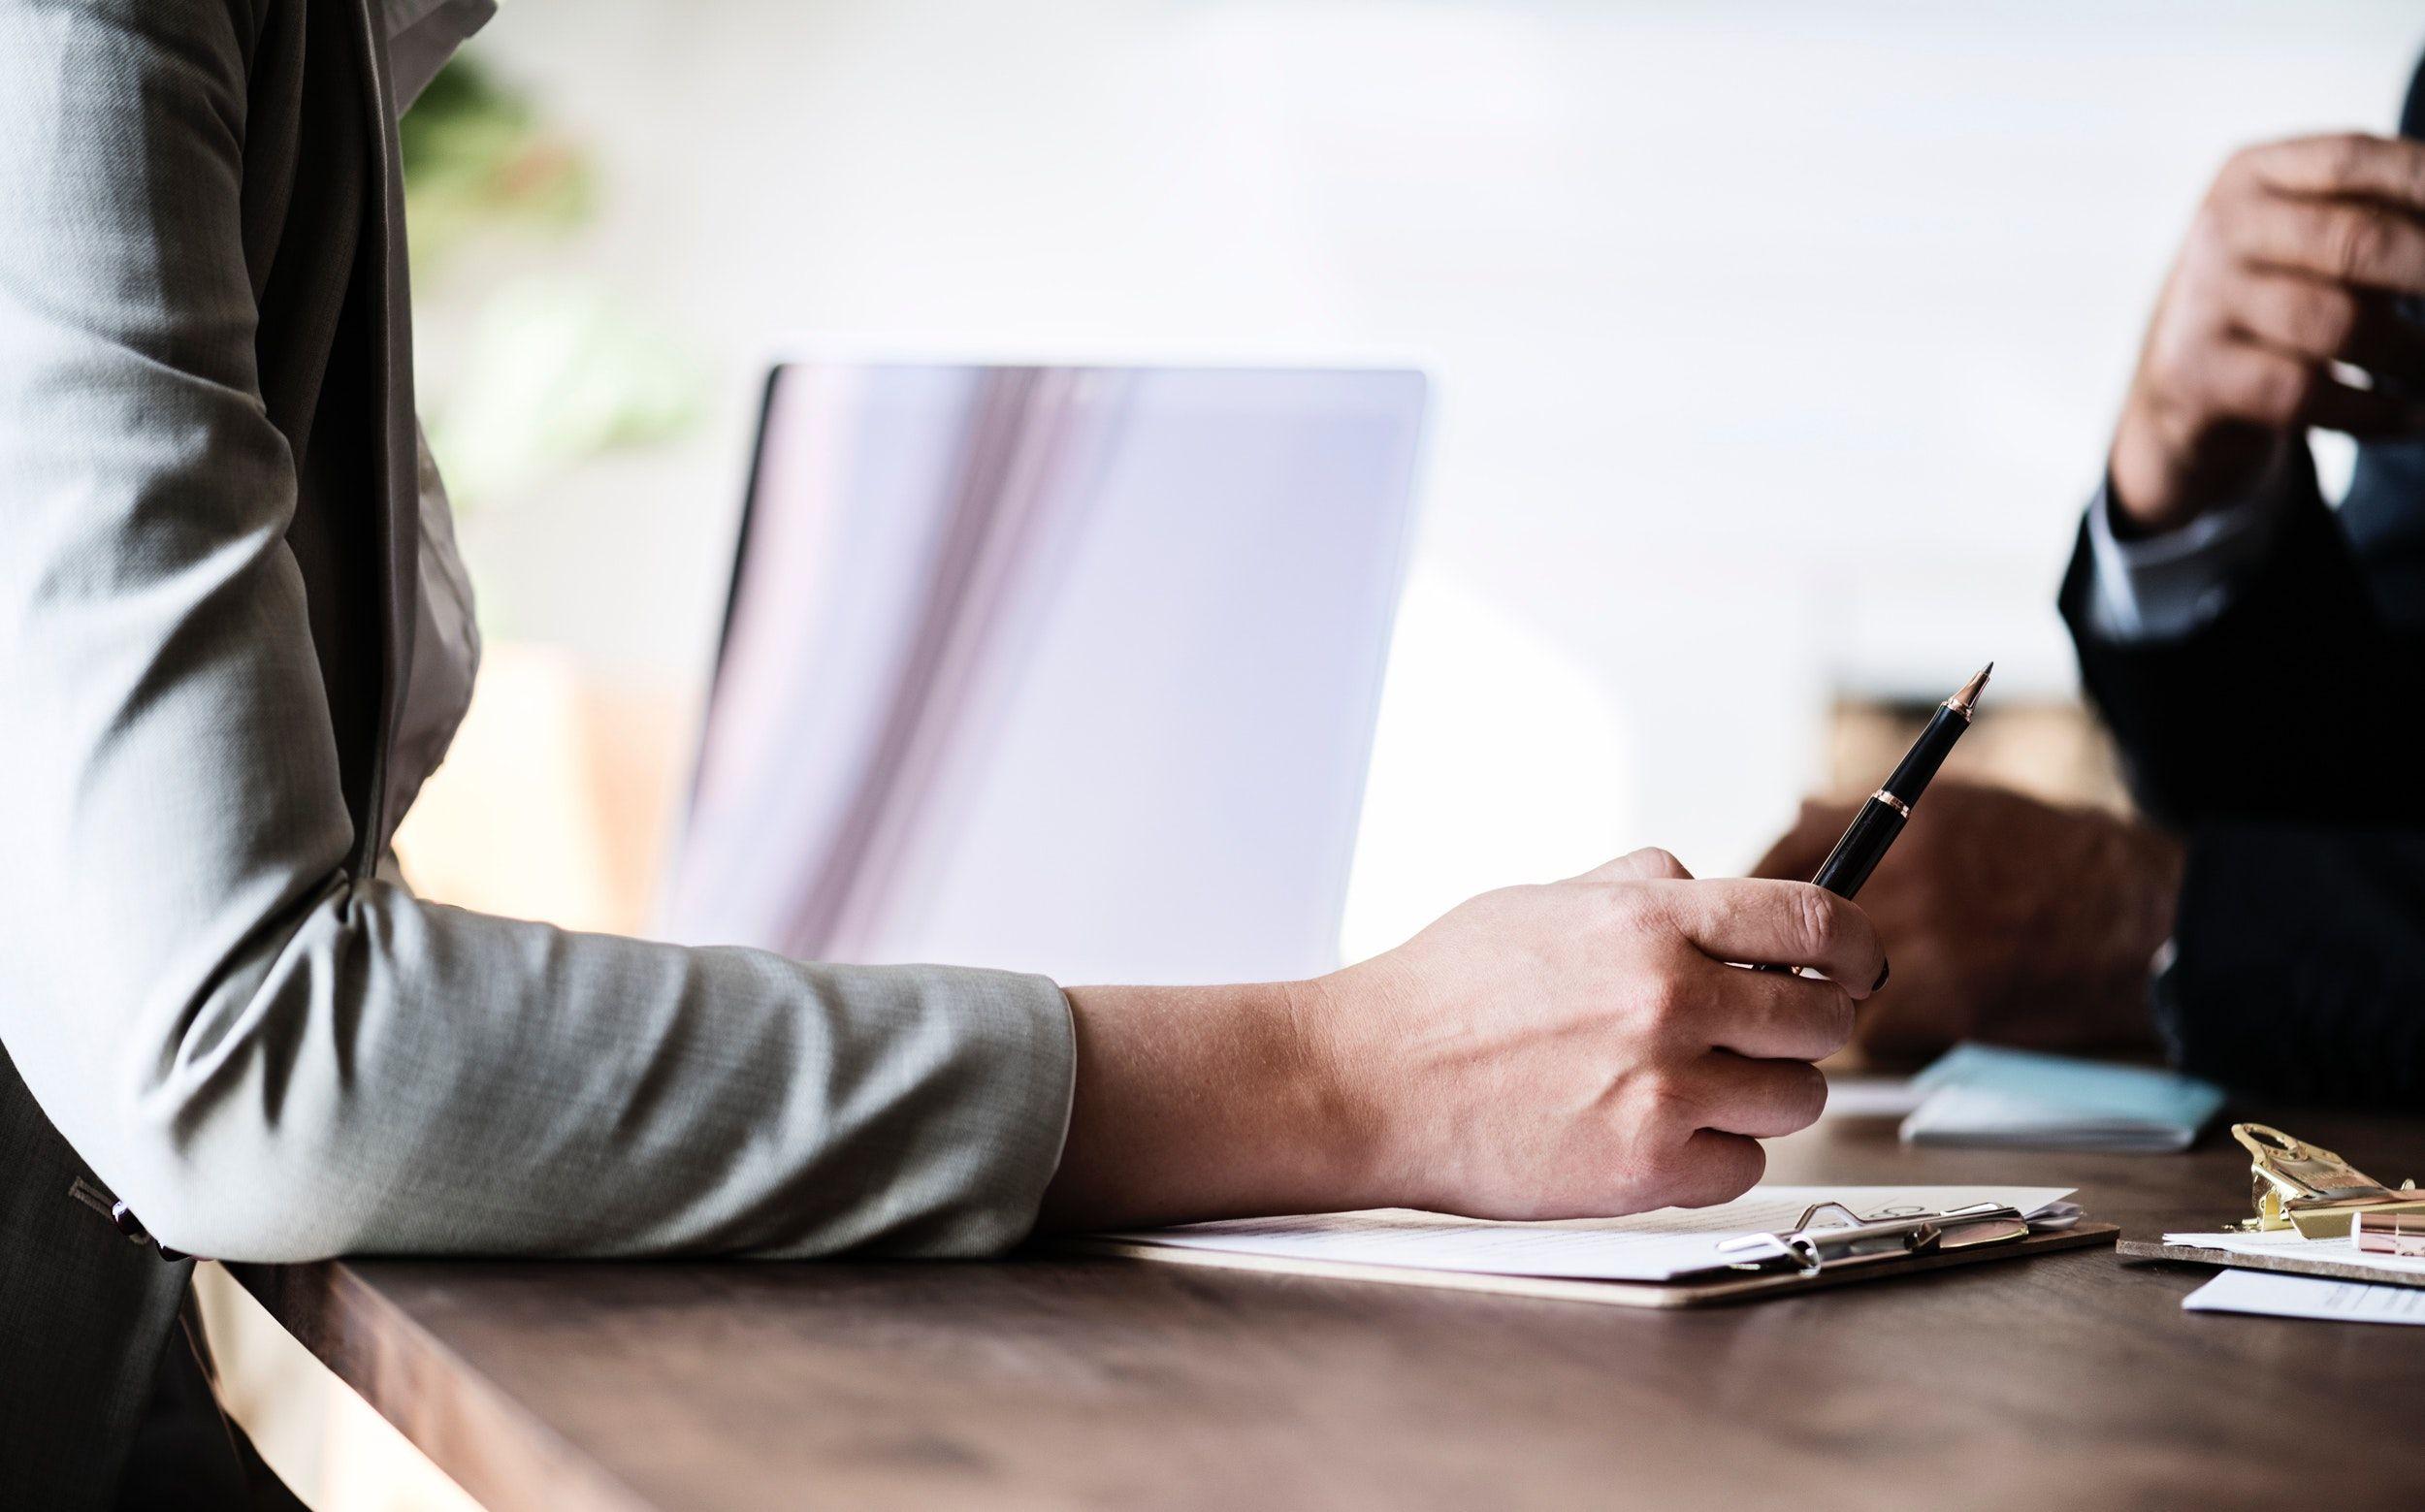 les-questions-interessantes-a-poser-en-entretien-d-embauche